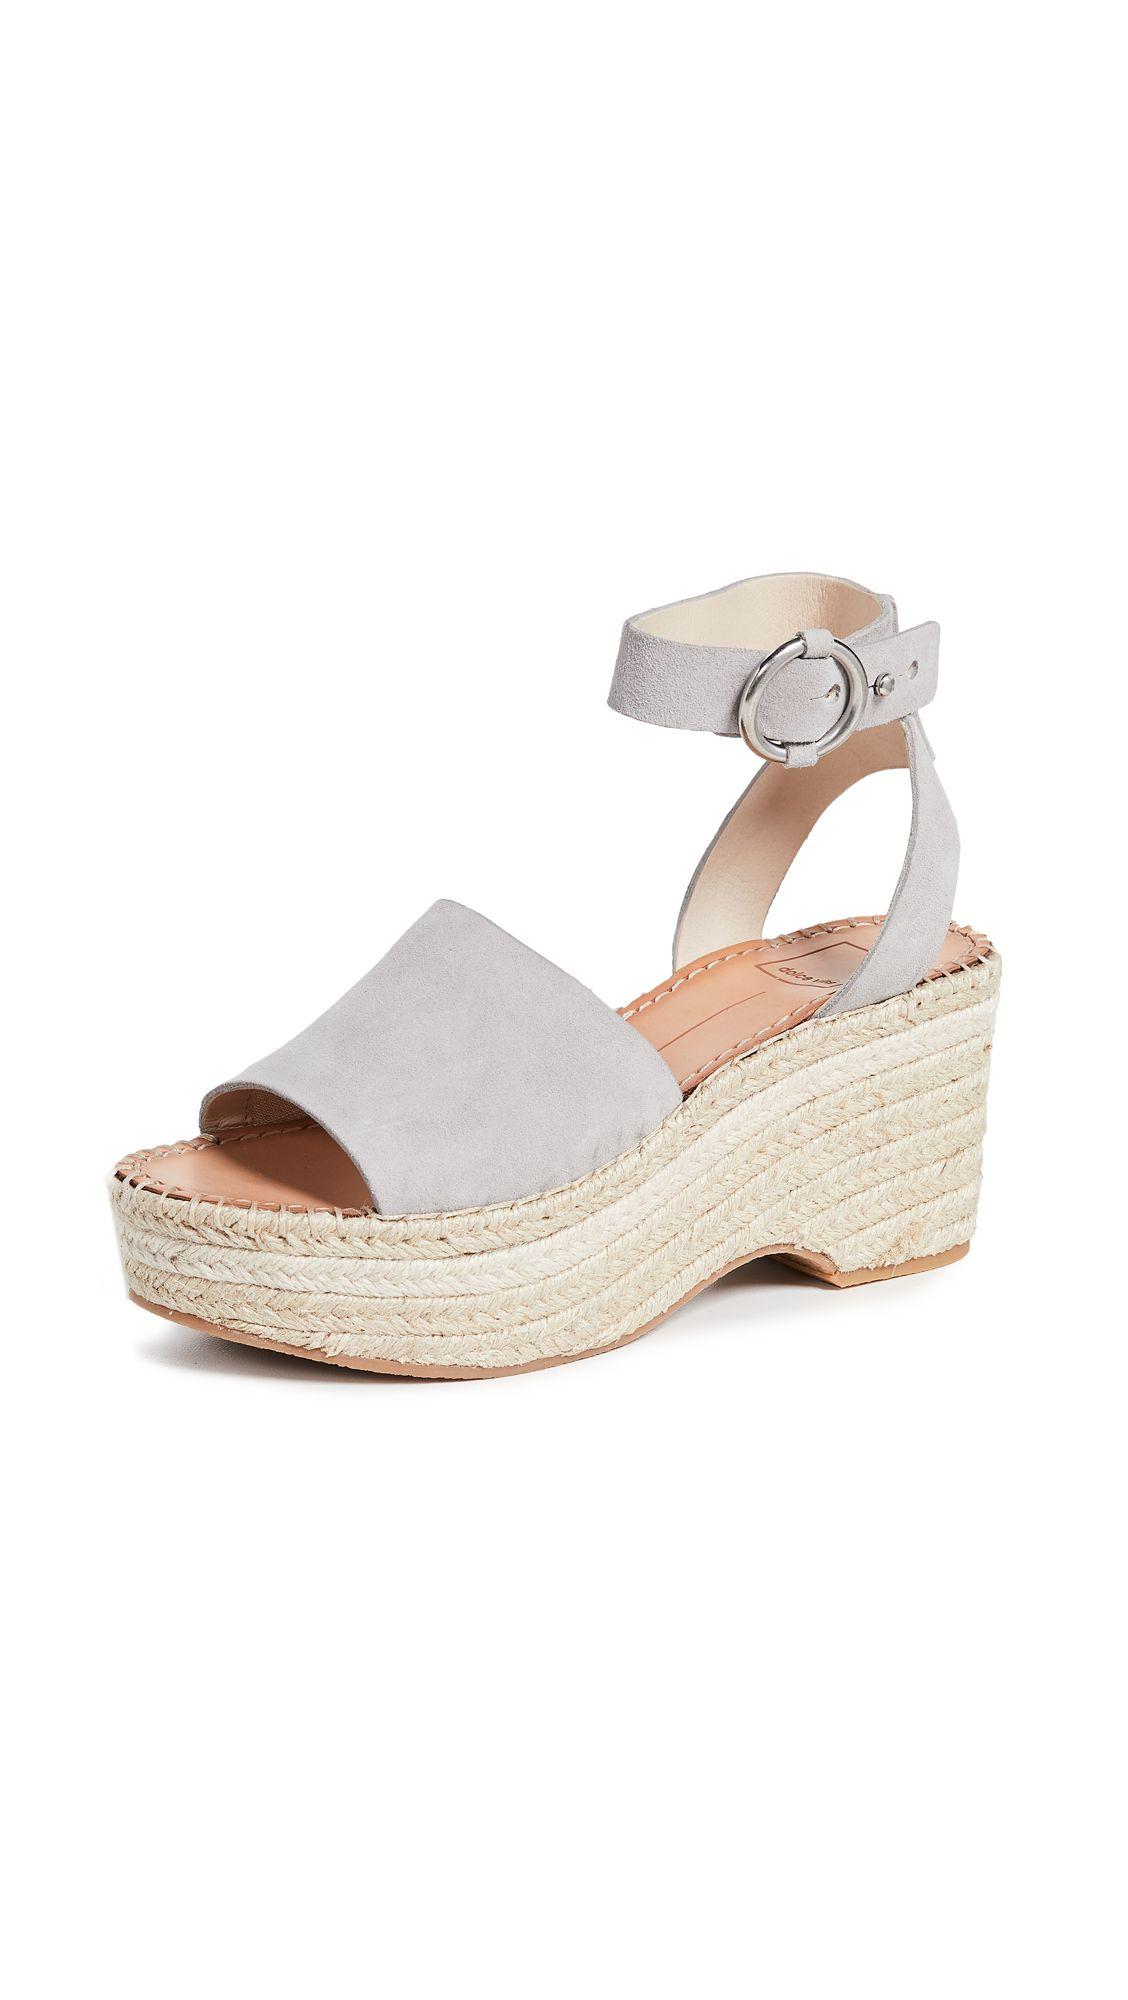 0003dc6b9ec Lesly Ankle Strap Espadrilles, #DolceVita #Grey ...